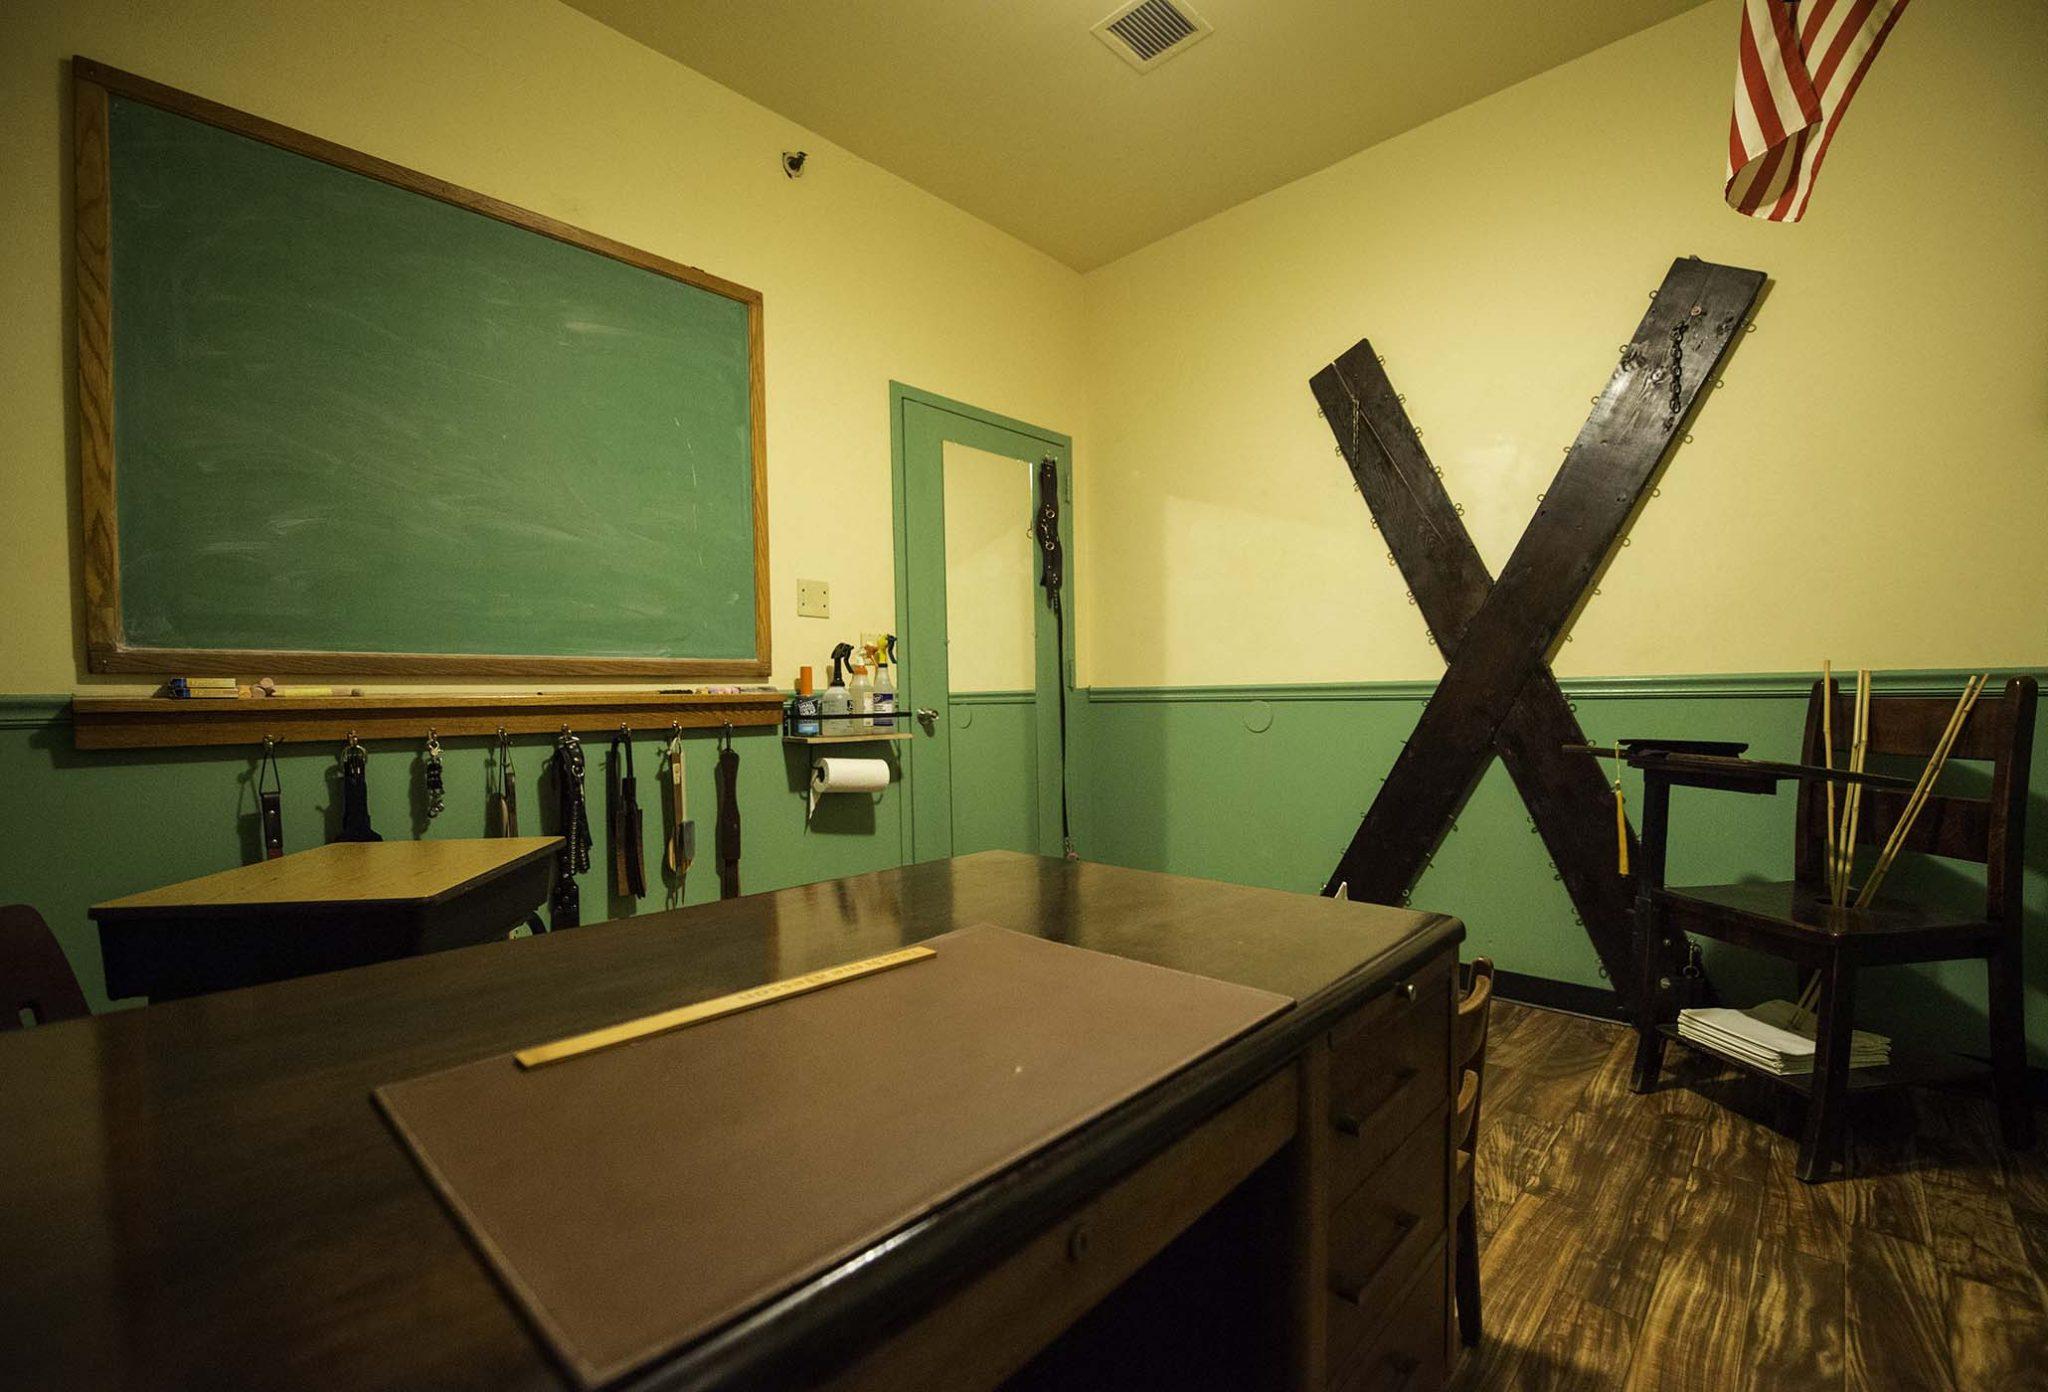 classroom 2 1 2048x1392 1